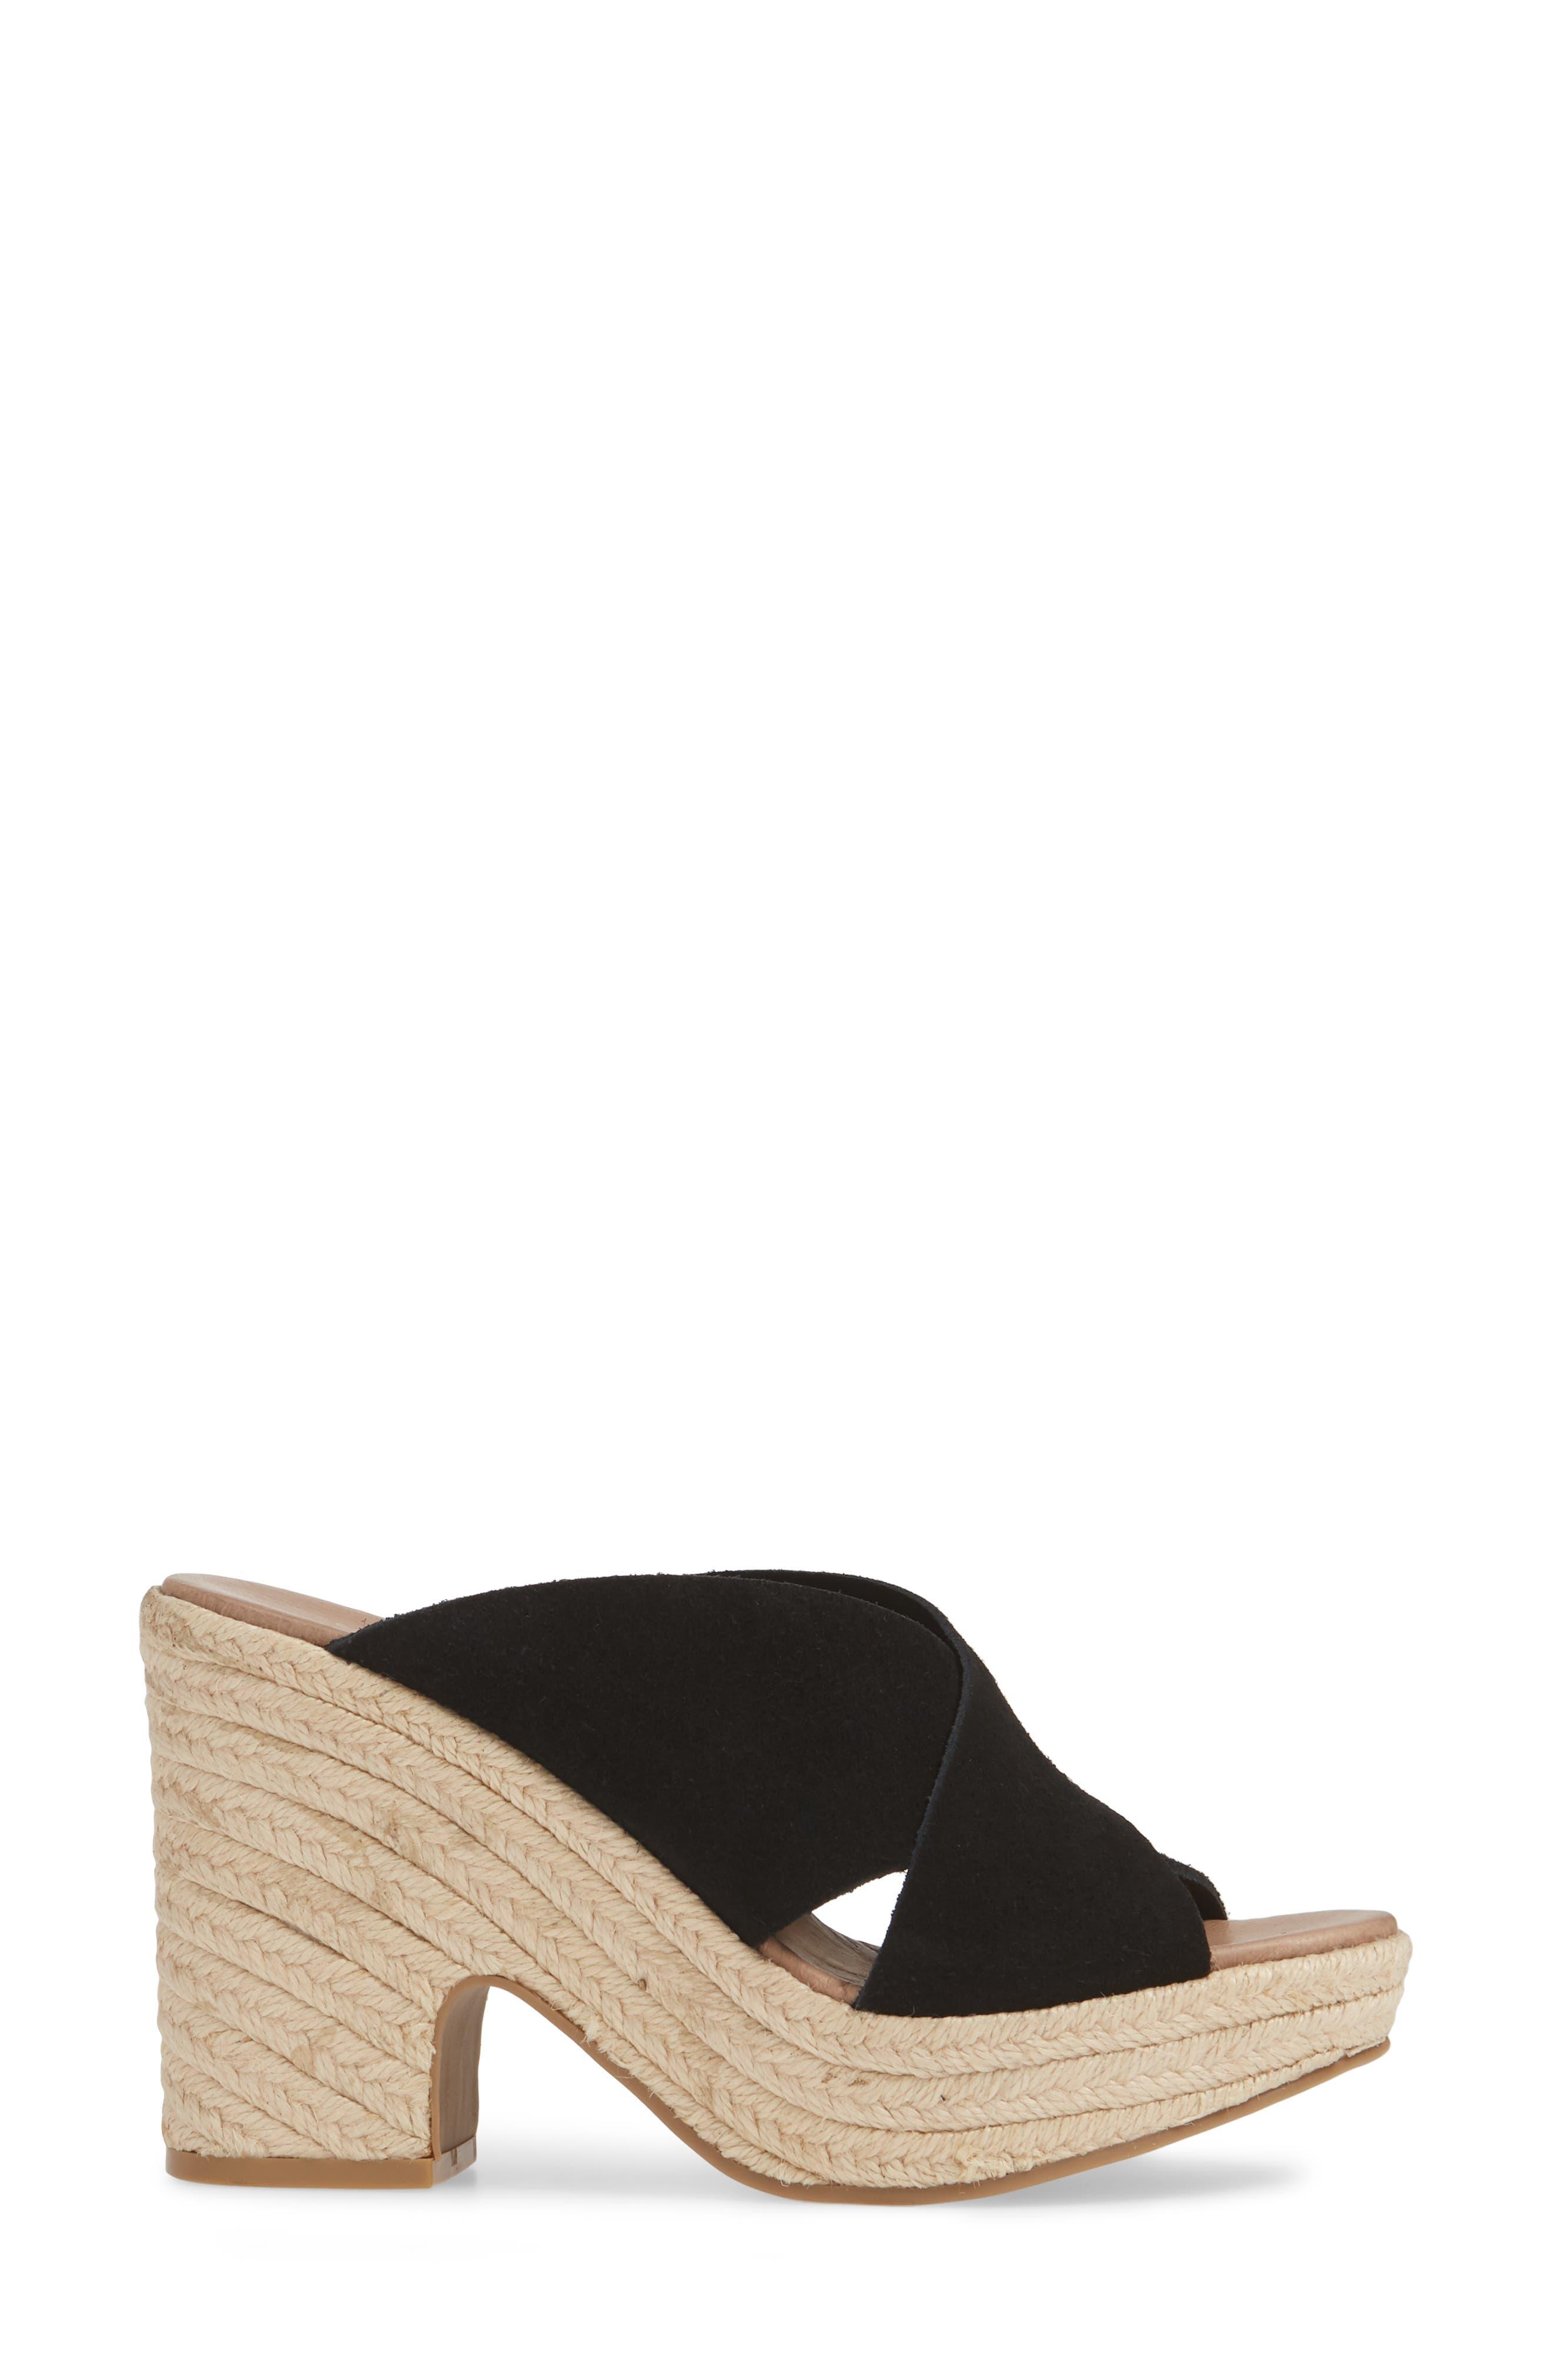 CHINESE LAUNDRY, Quay Platform Sandal, Alternate thumbnail 3, color, BLACK SUEDE